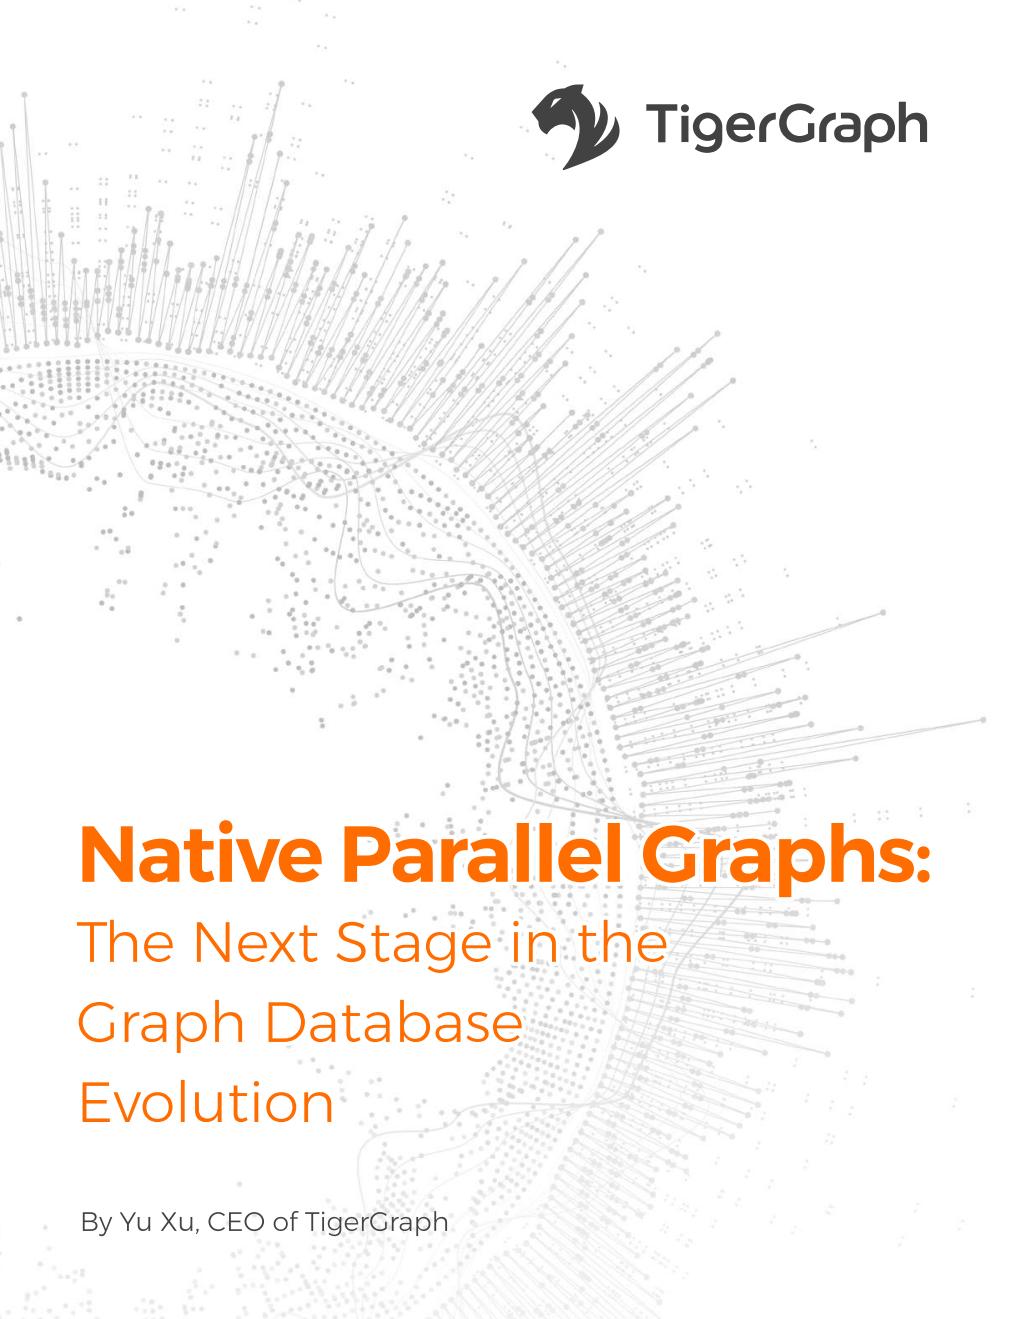 Native Parallel Graph Thumbnail.png